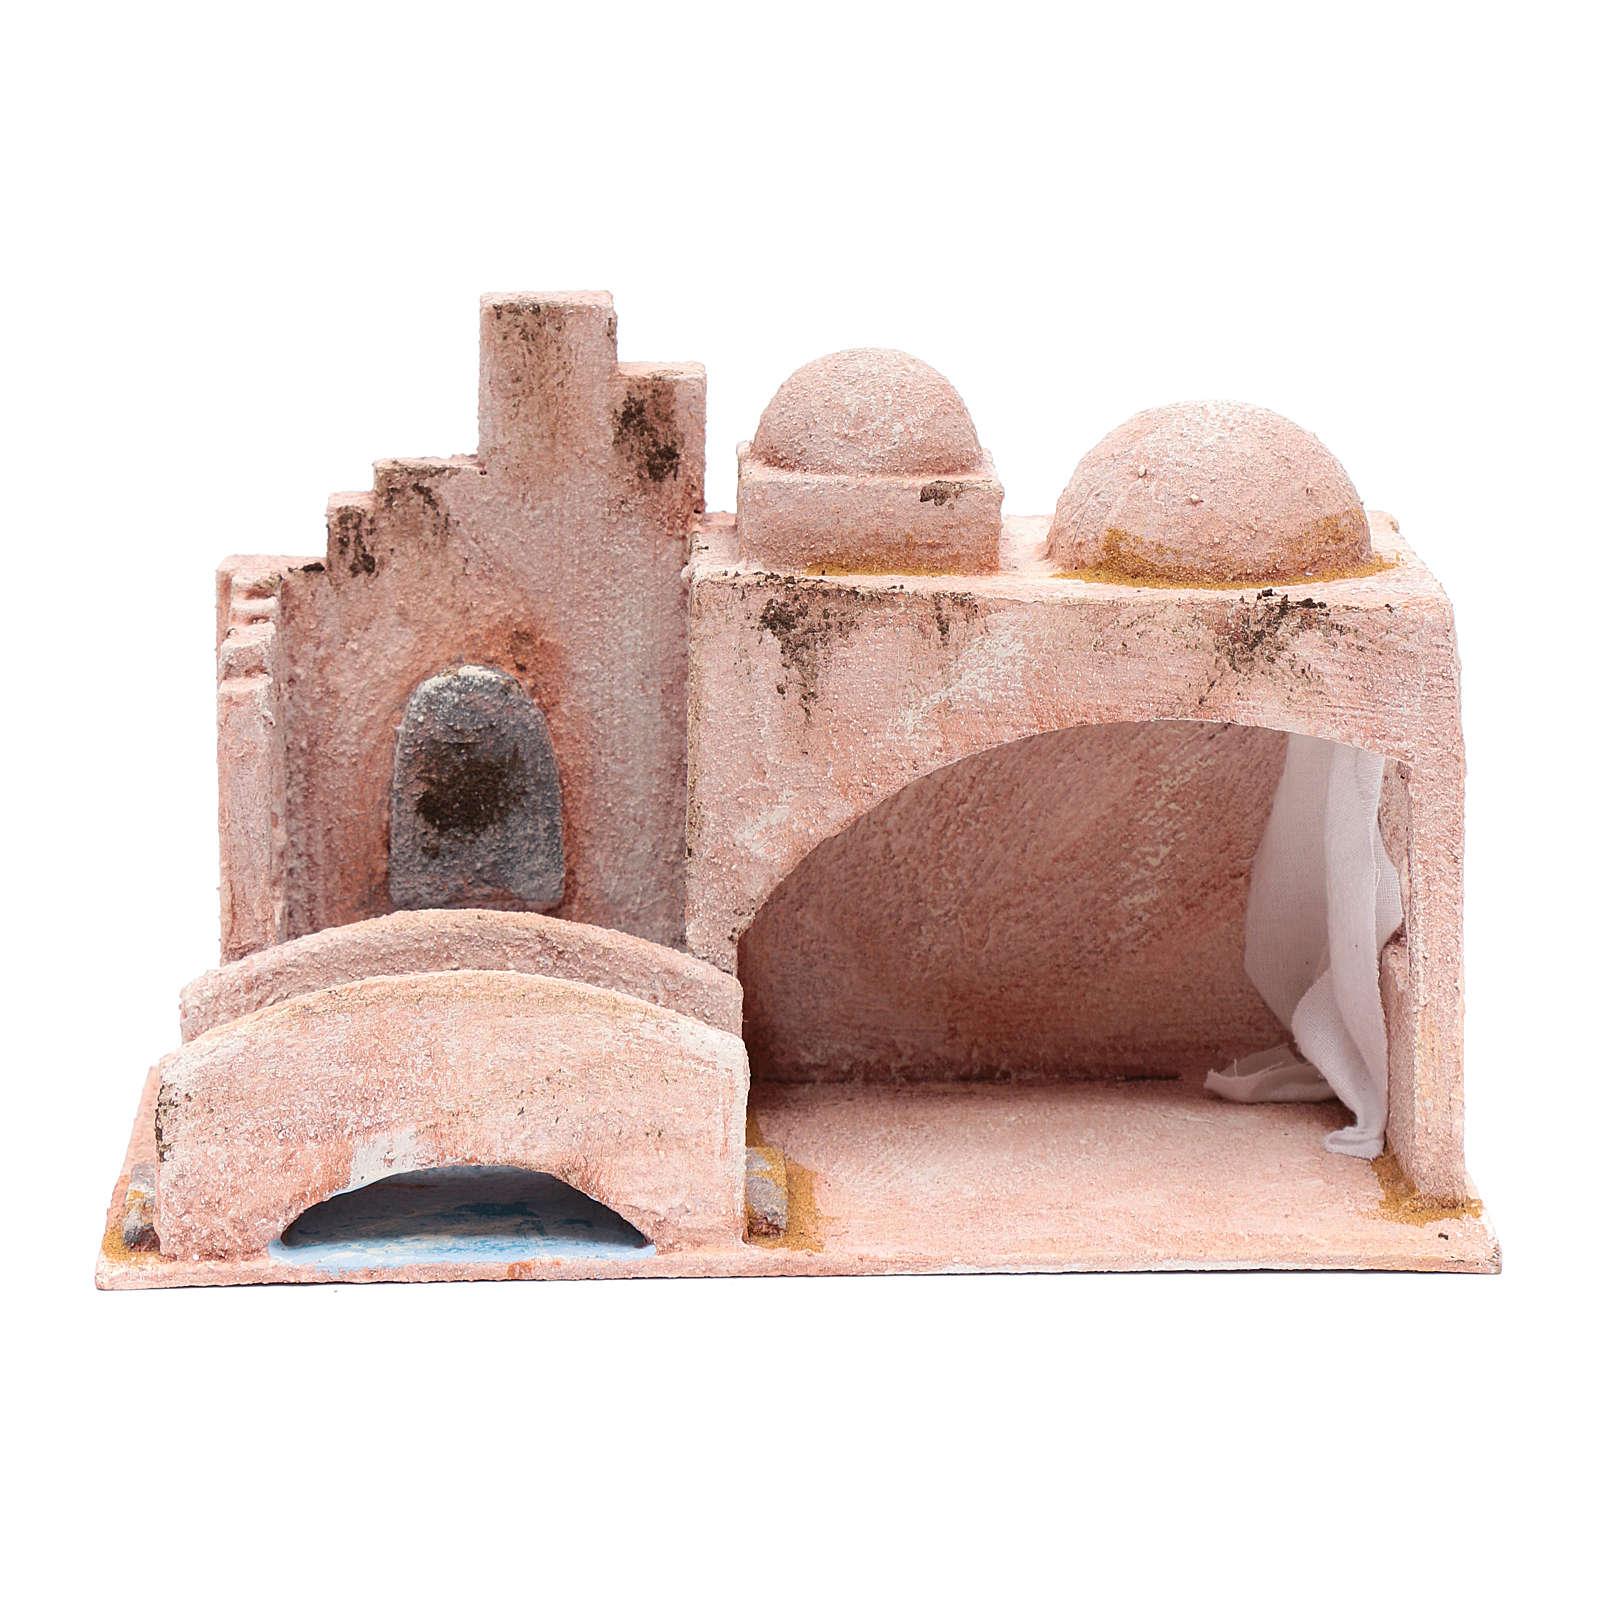 Capanna stile arabo con laghetto 18,5x29x15 presepe 10 cm 4